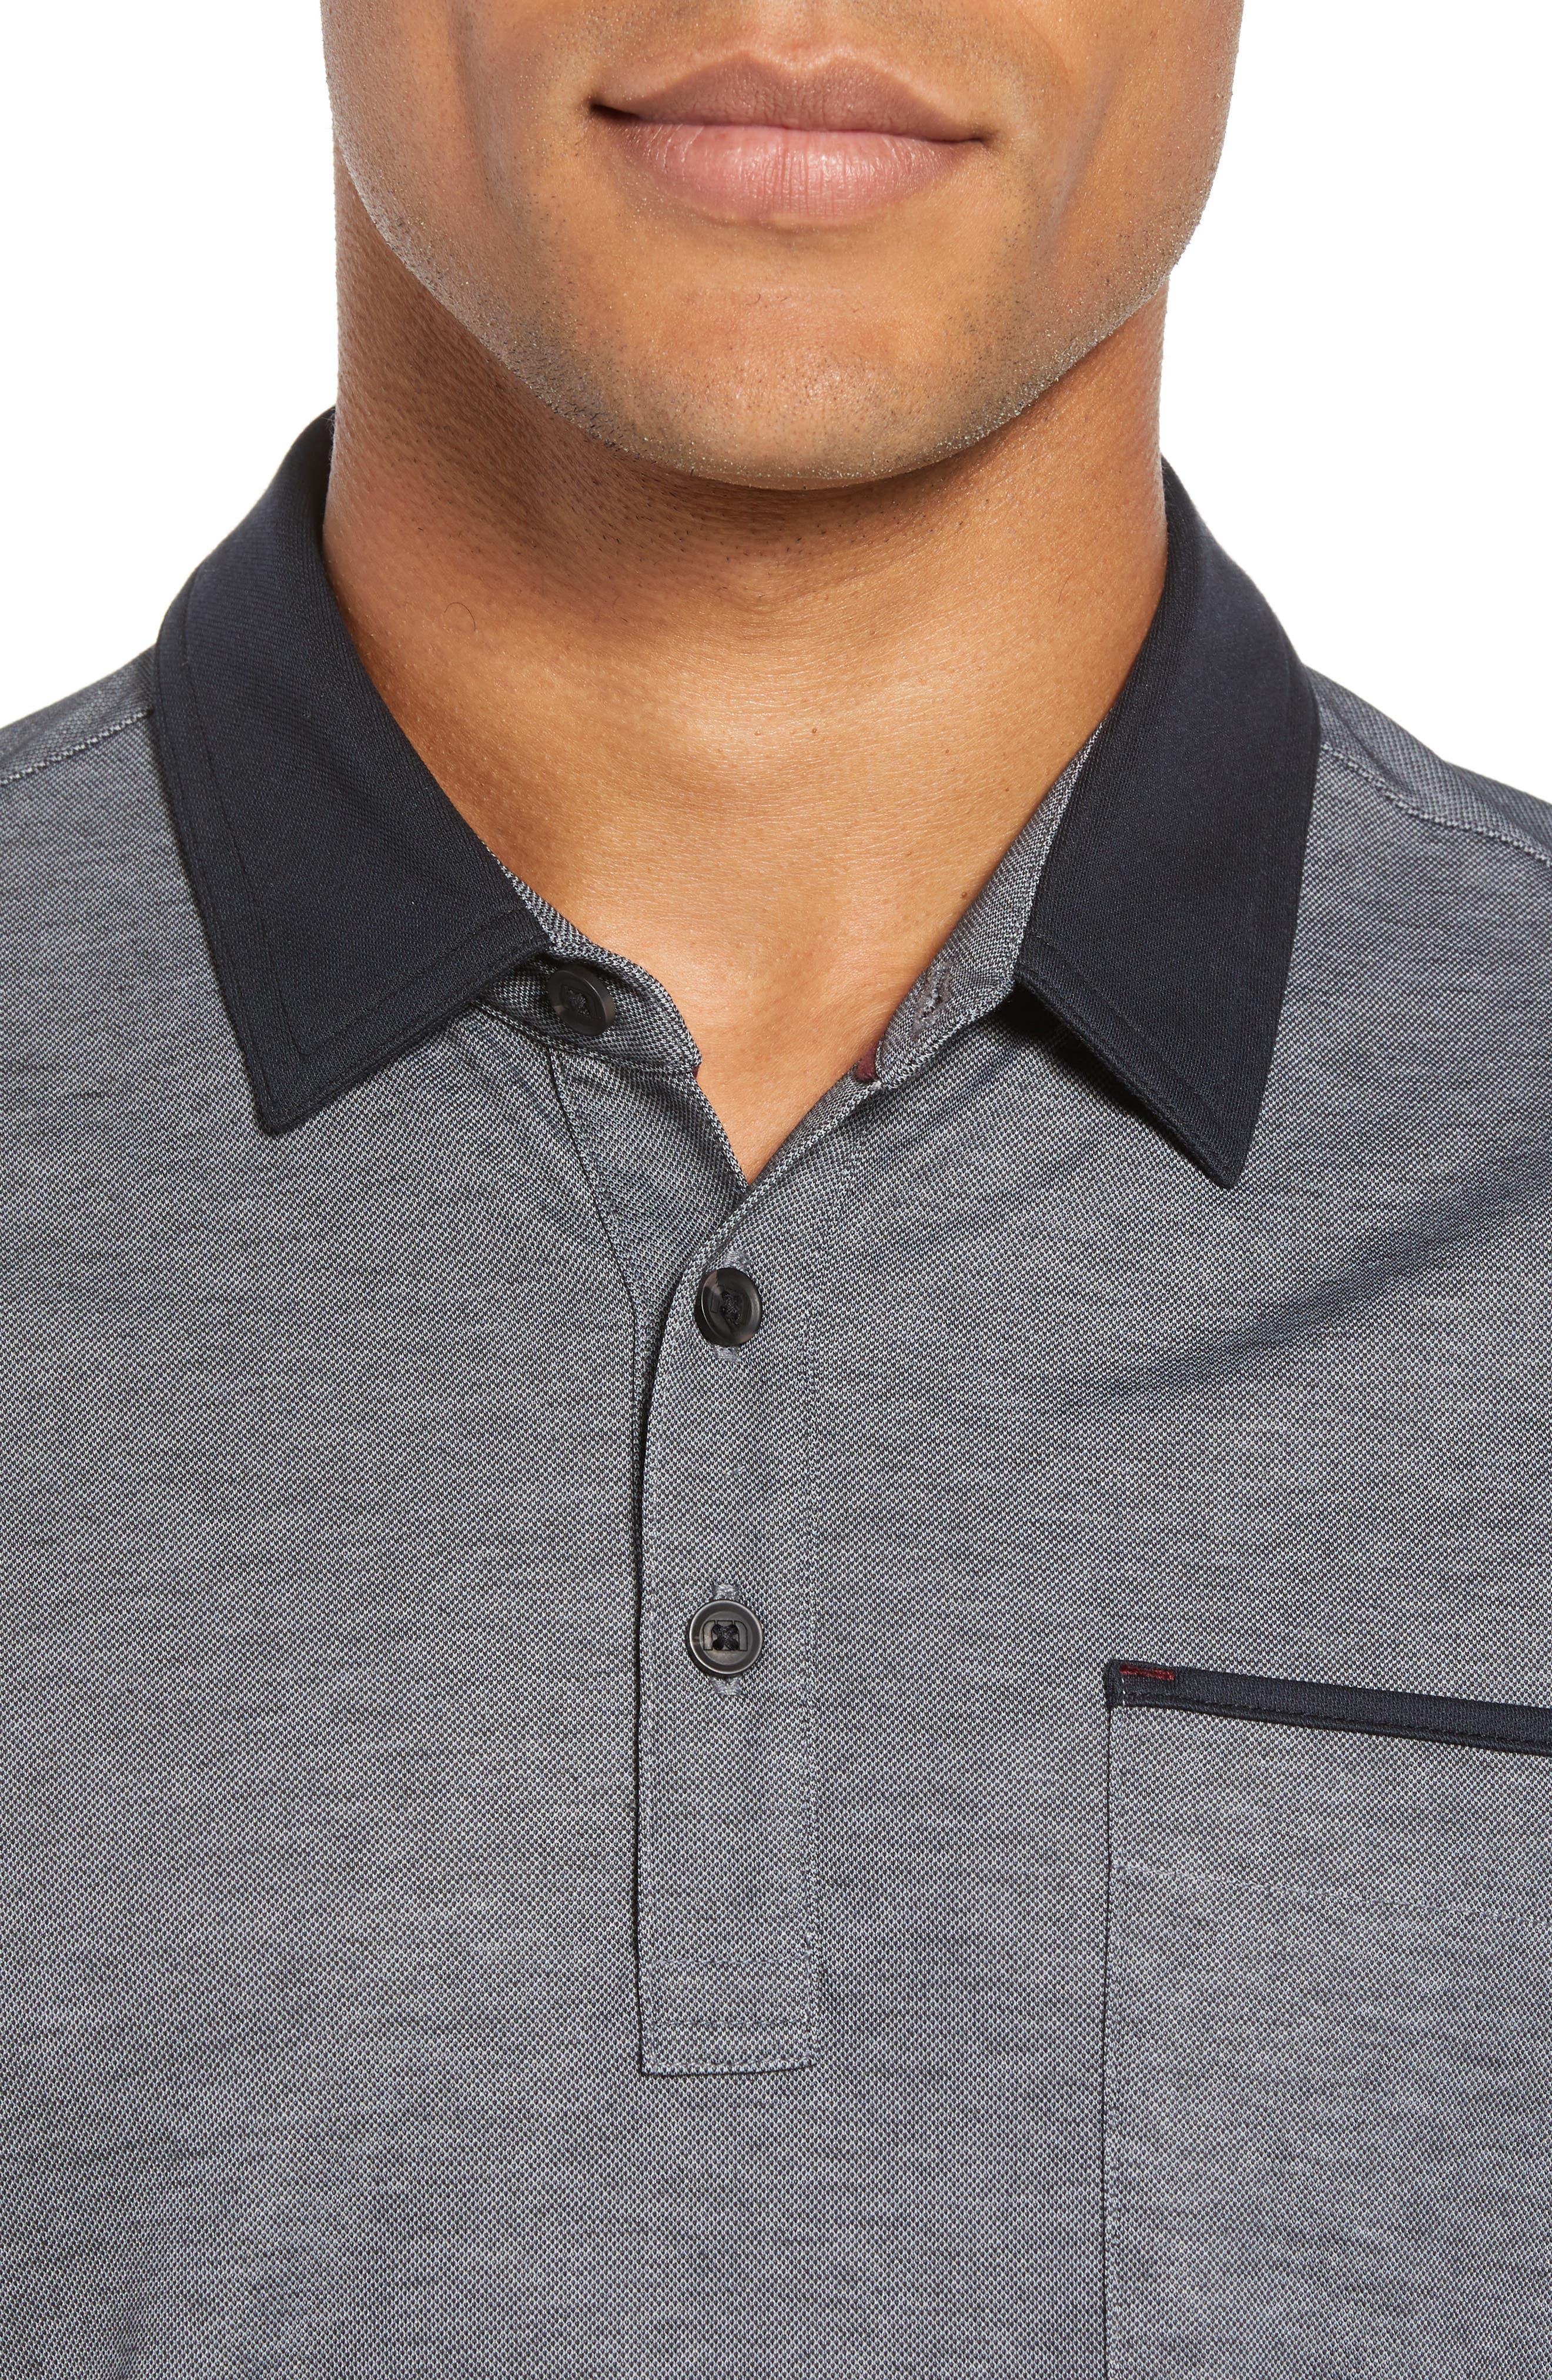 Kay Regular Fit Long Sleeve Polo Shirt,                             Alternate thumbnail 4, color,                             HEATHER CASTLEROCK